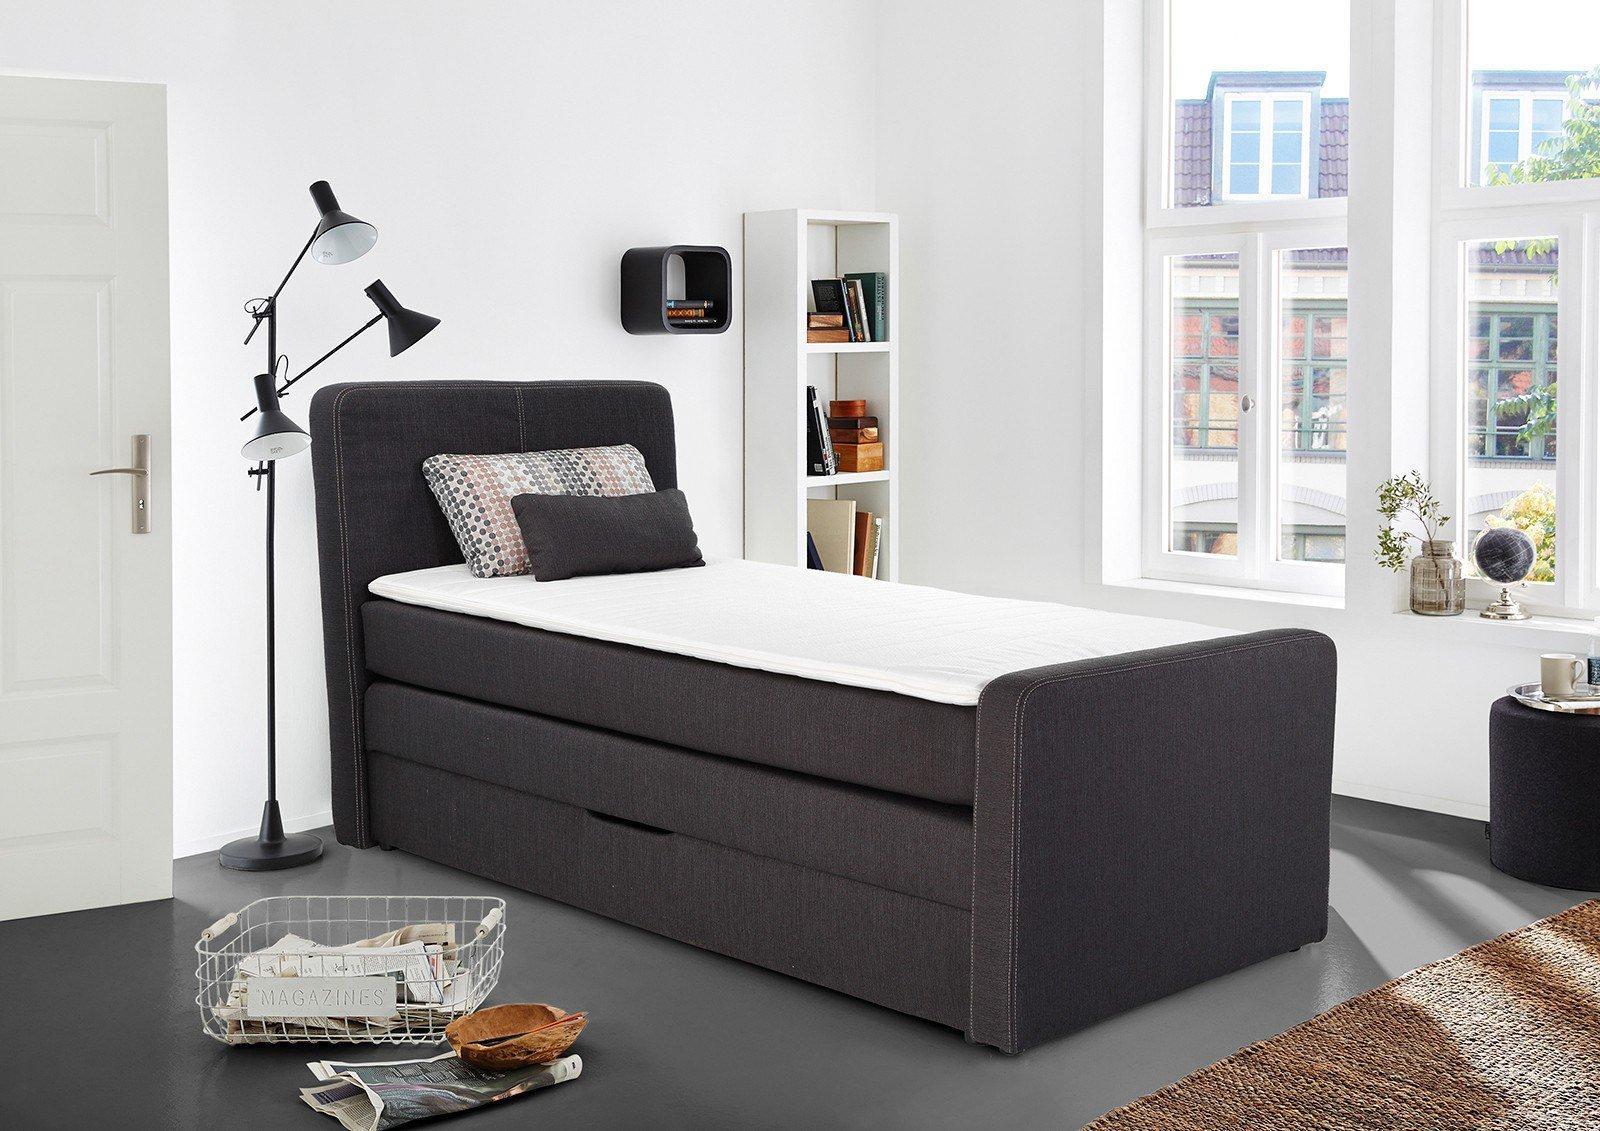 jockenh fer boxspringbett gibraltar 90 x 200 cm in anthrazit m bel letz ihr online shop. Black Bedroom Furniture Sets. Home Design Ideas